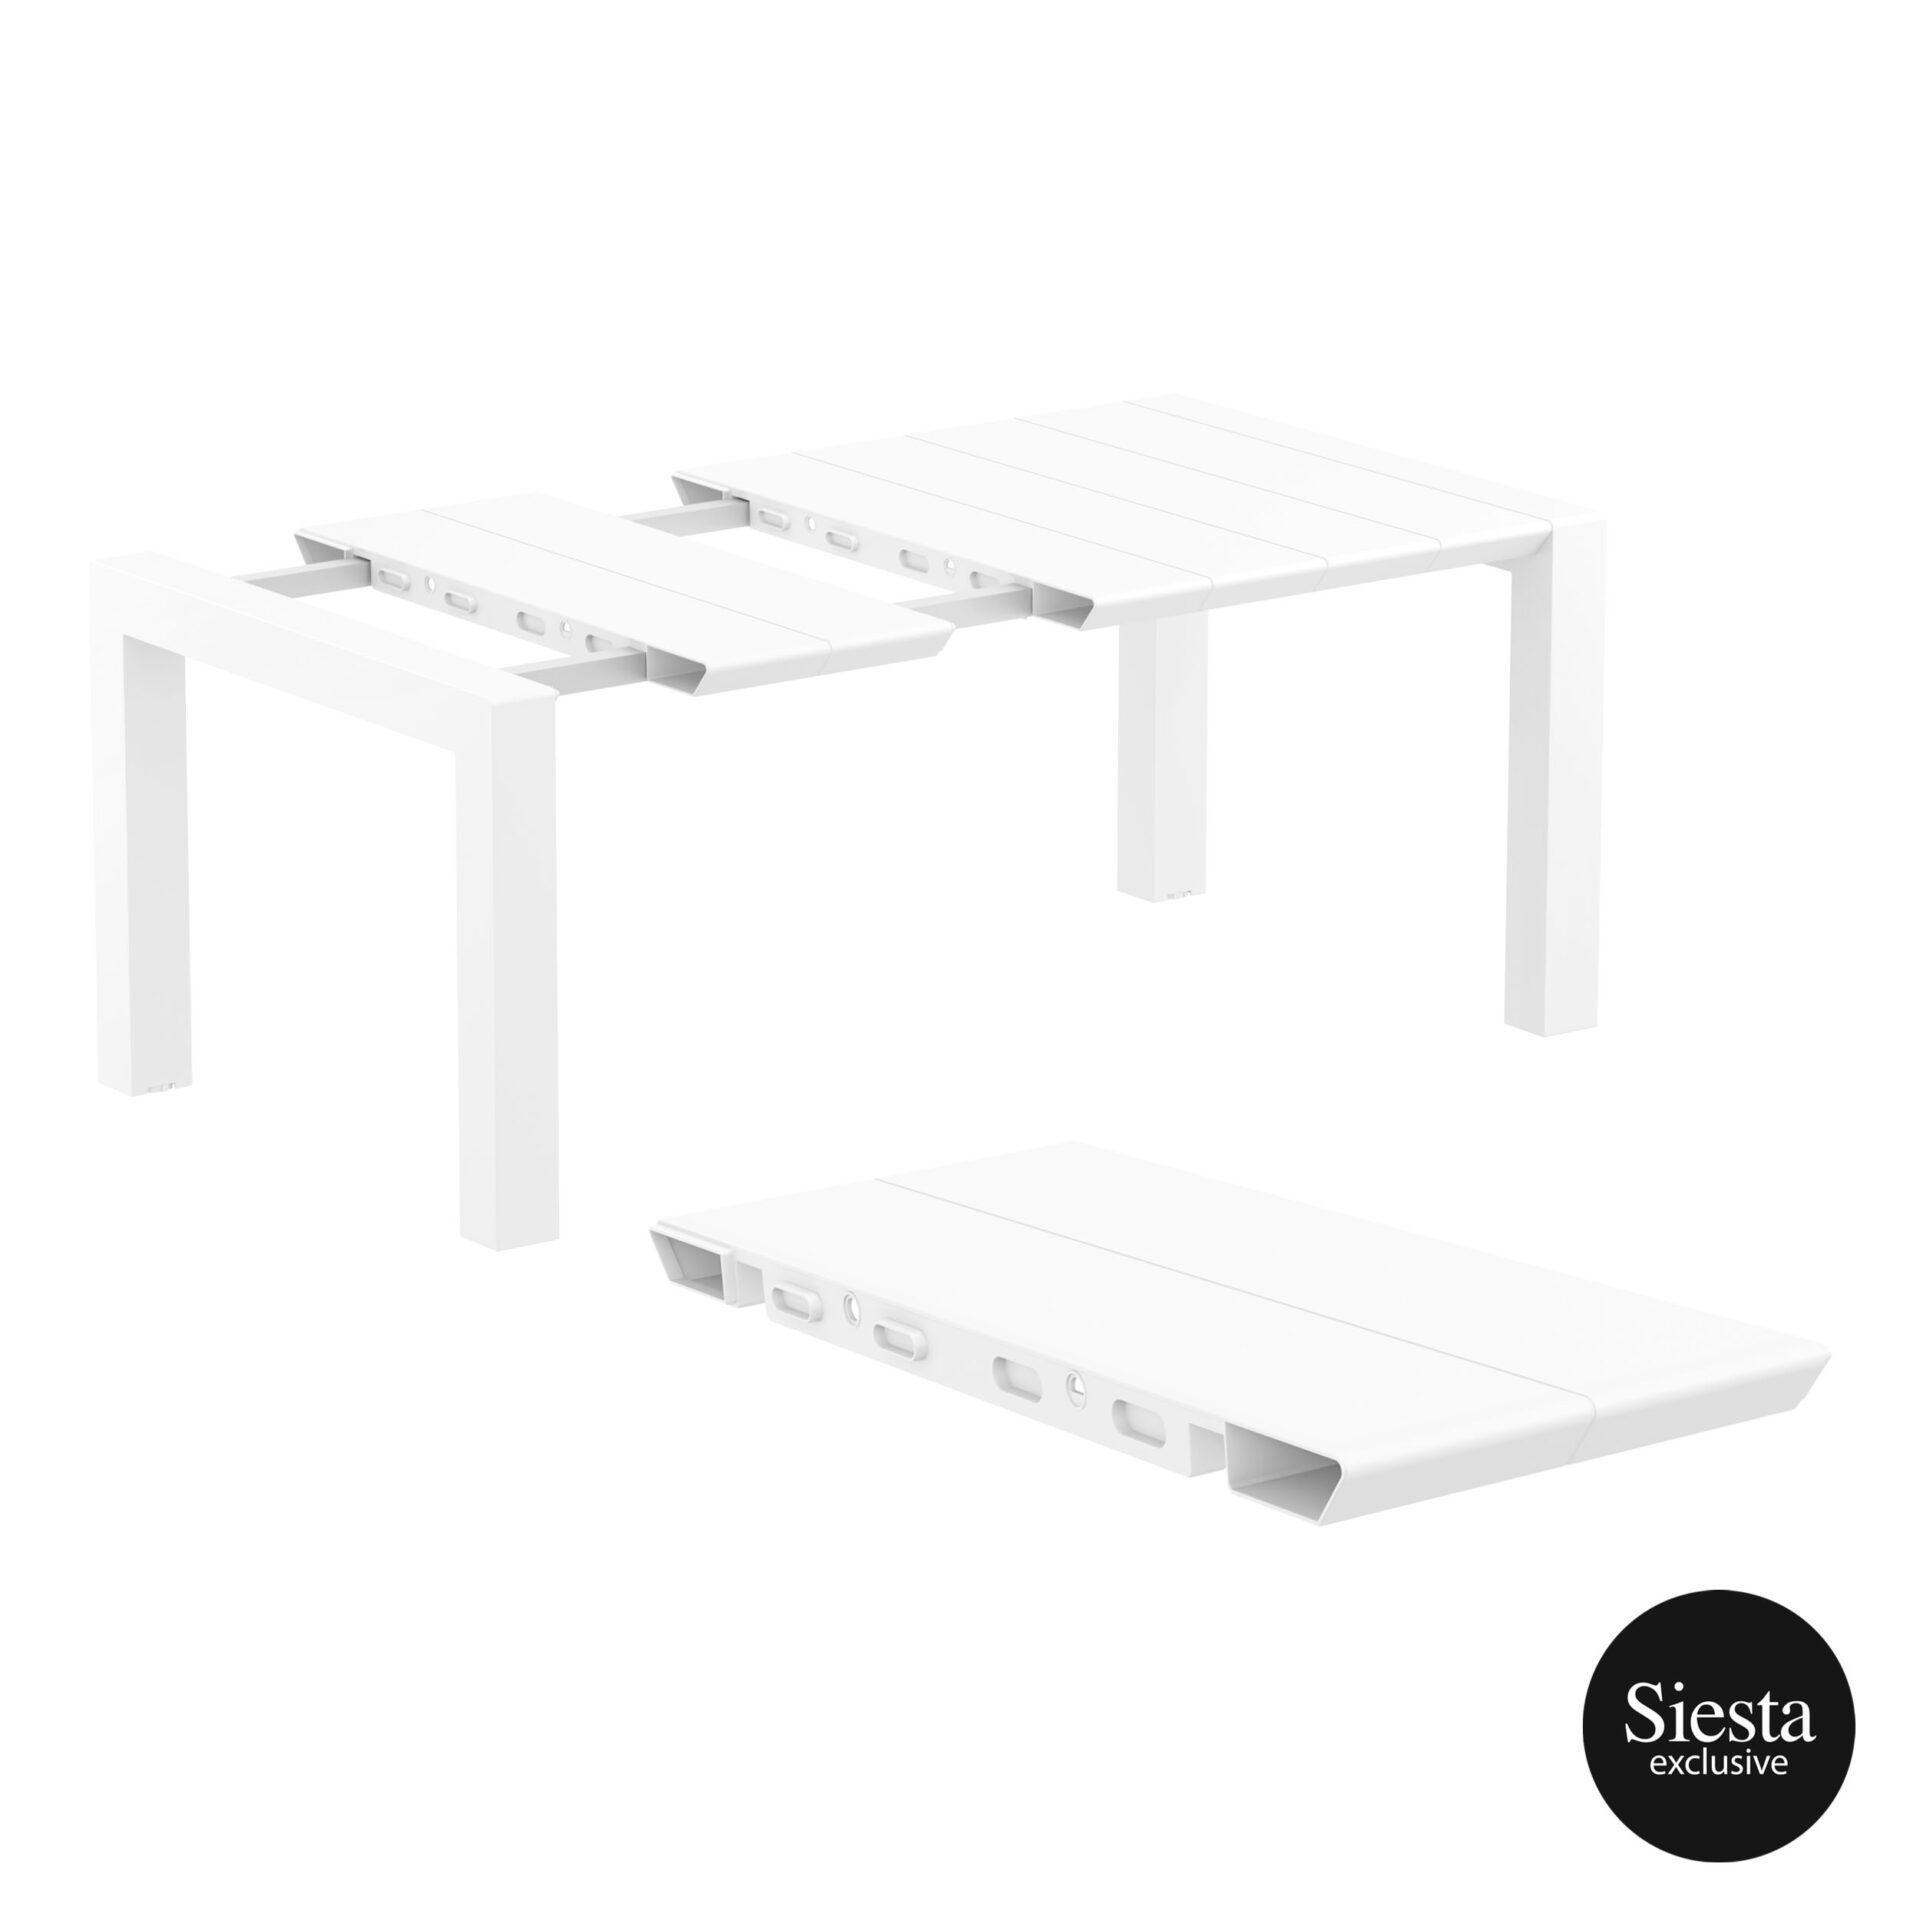 013 vegas table 140 white extension part